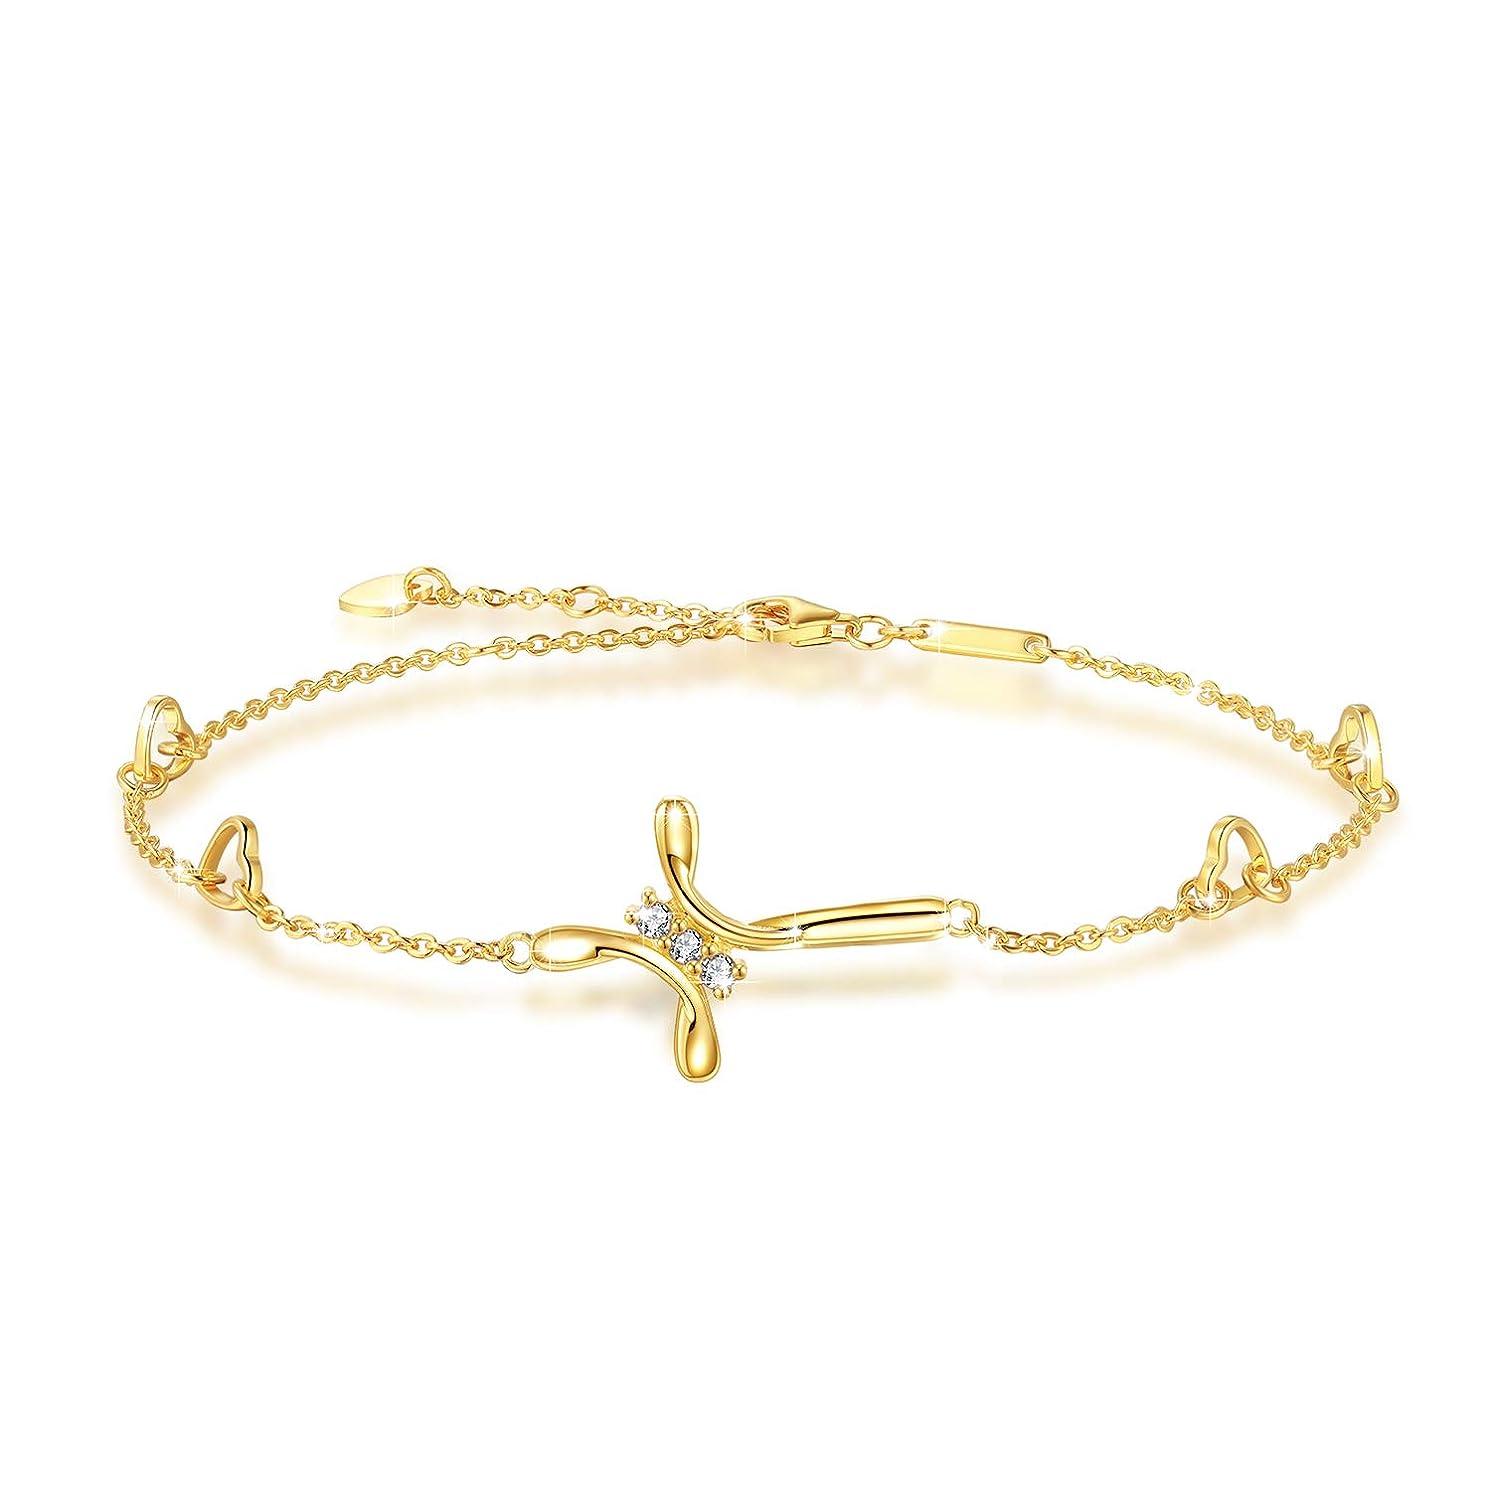 OneSight Cross Ankle Bracelet for Women, 925 Sterling Silver Charm Adjustable Foot Anklet, Large Cross Bracelet